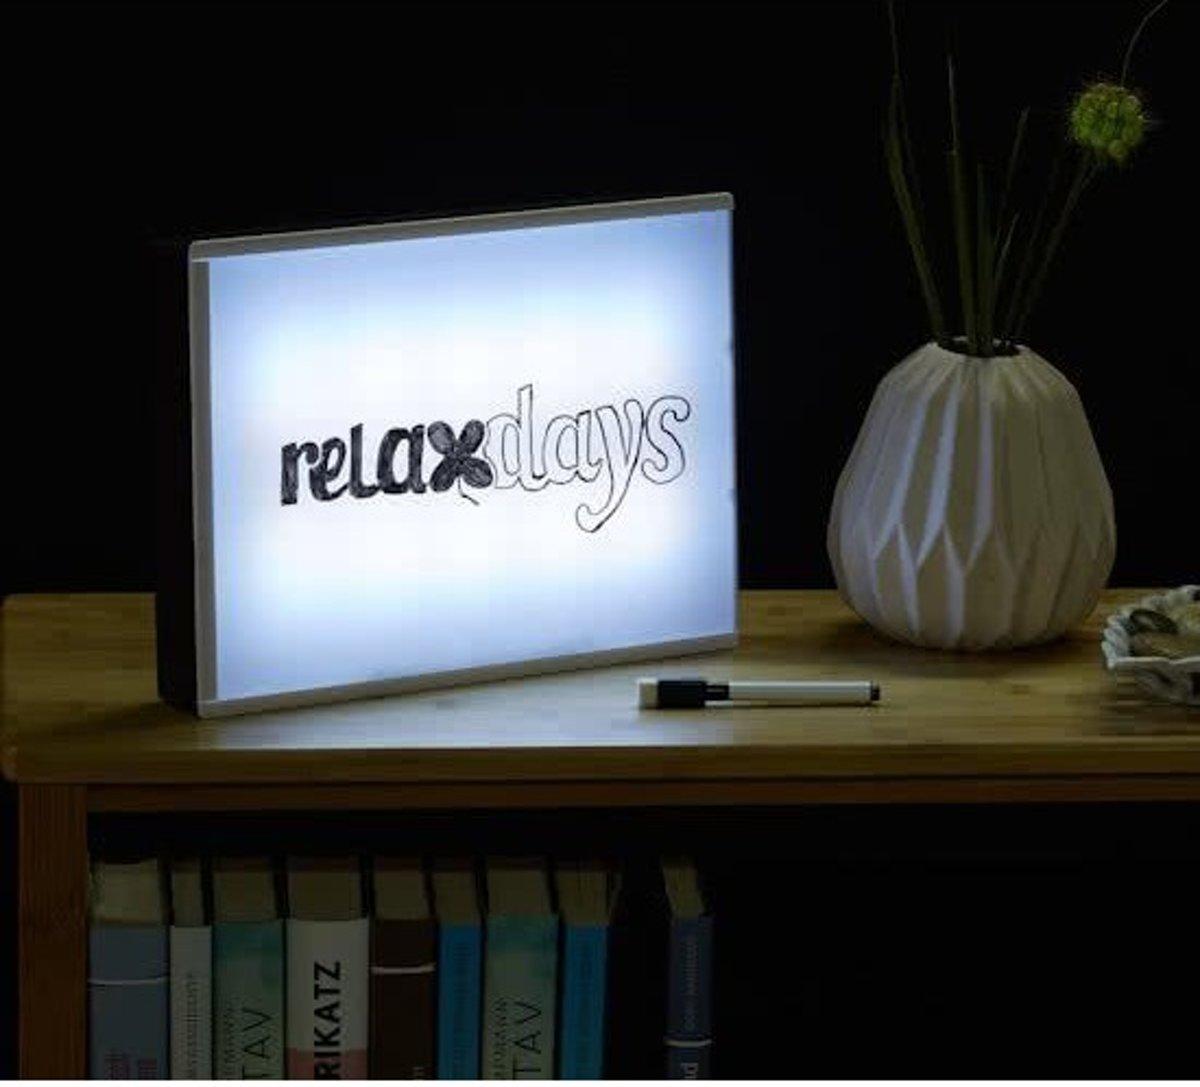 Relaxdays    LED lightbox A4   Lichtbak   LED LIGHT BOX   Lichtkrant set   Folie - Light Box    Letters en Tekst schrijven op Lamp    Afm. 22 x 30 Cm. kopen